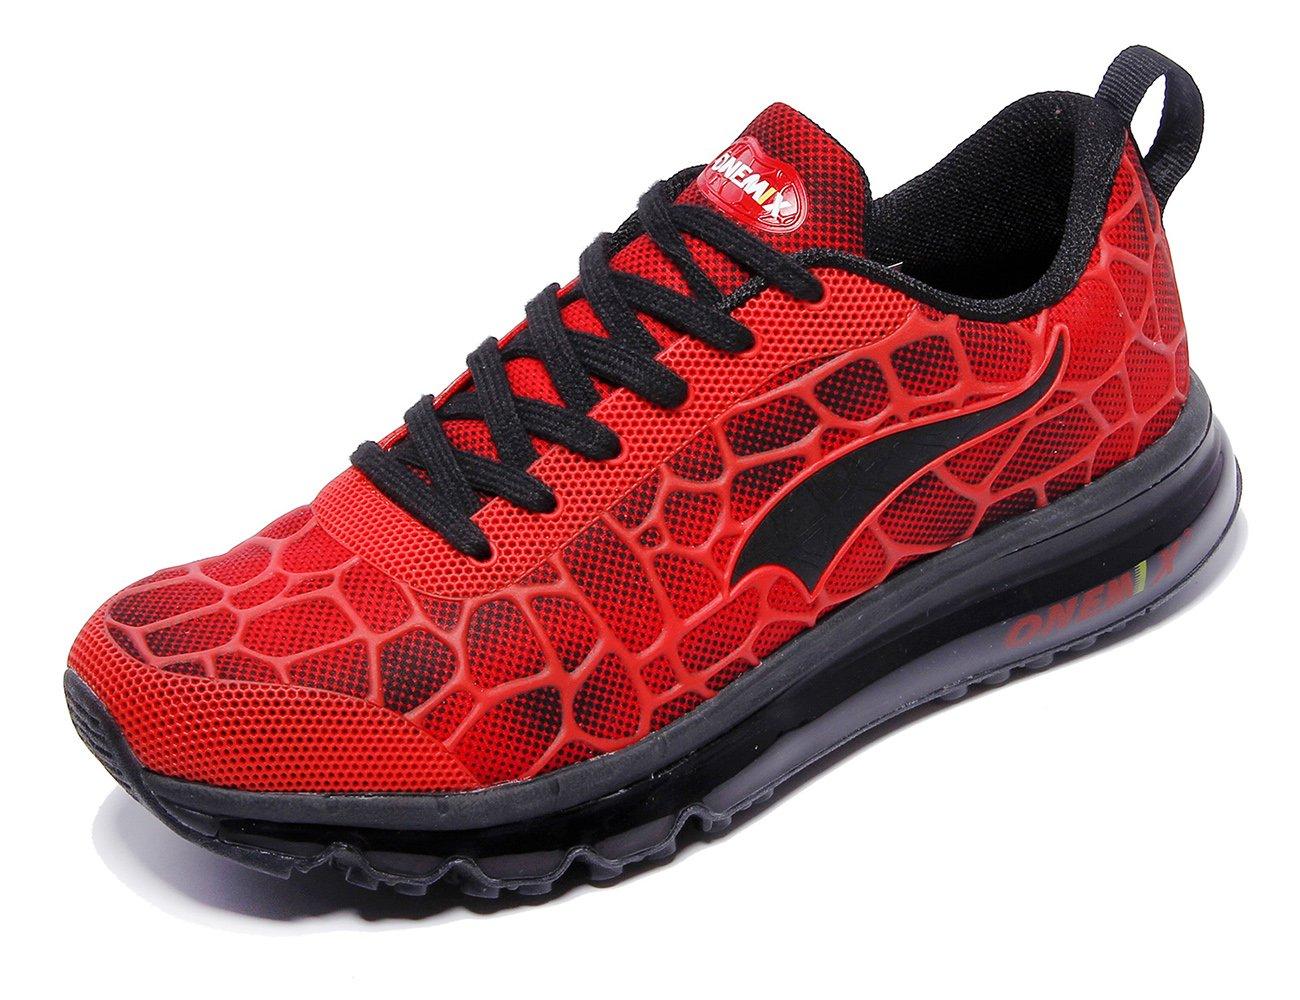 ONEMIX Women's Air Cushiong Running Shoes,Lightweight Sport Athletic Sneakers B07C6QLFSN Men 6.5(M)US 39EU/women 8(M)US 39EU|Red/Black